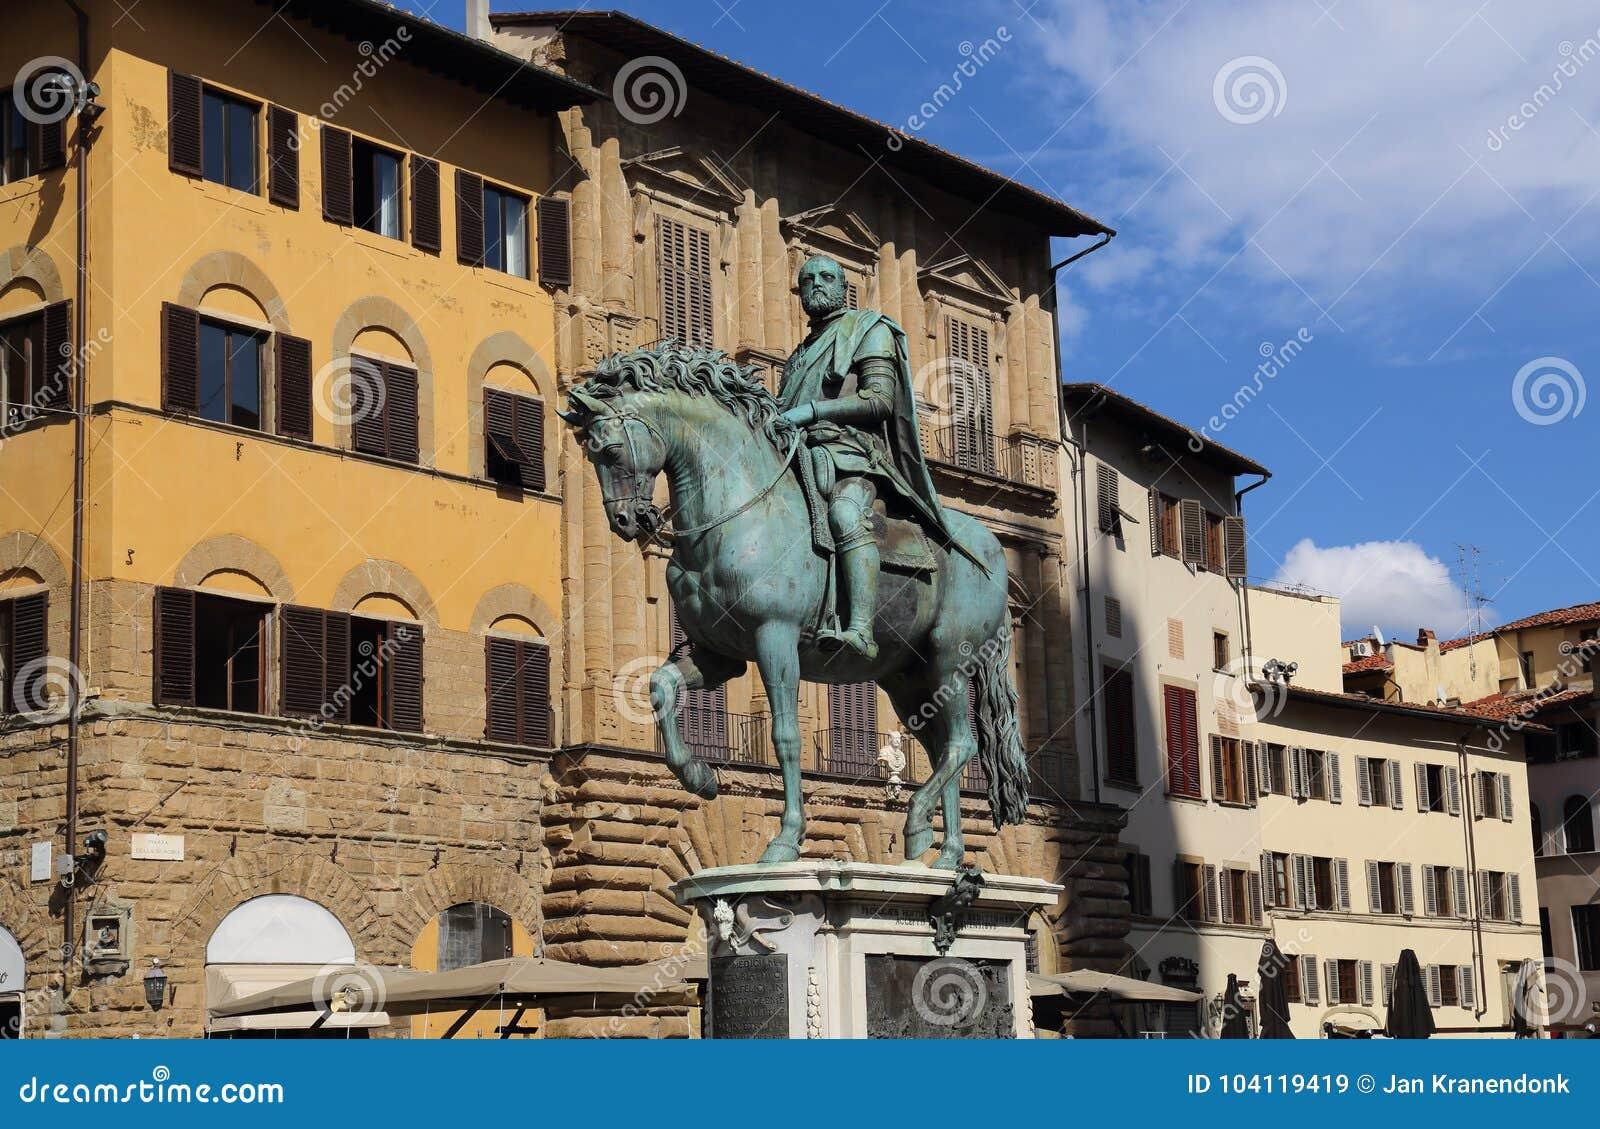 Statua equestre di Cosimo I a Firenze, Italia